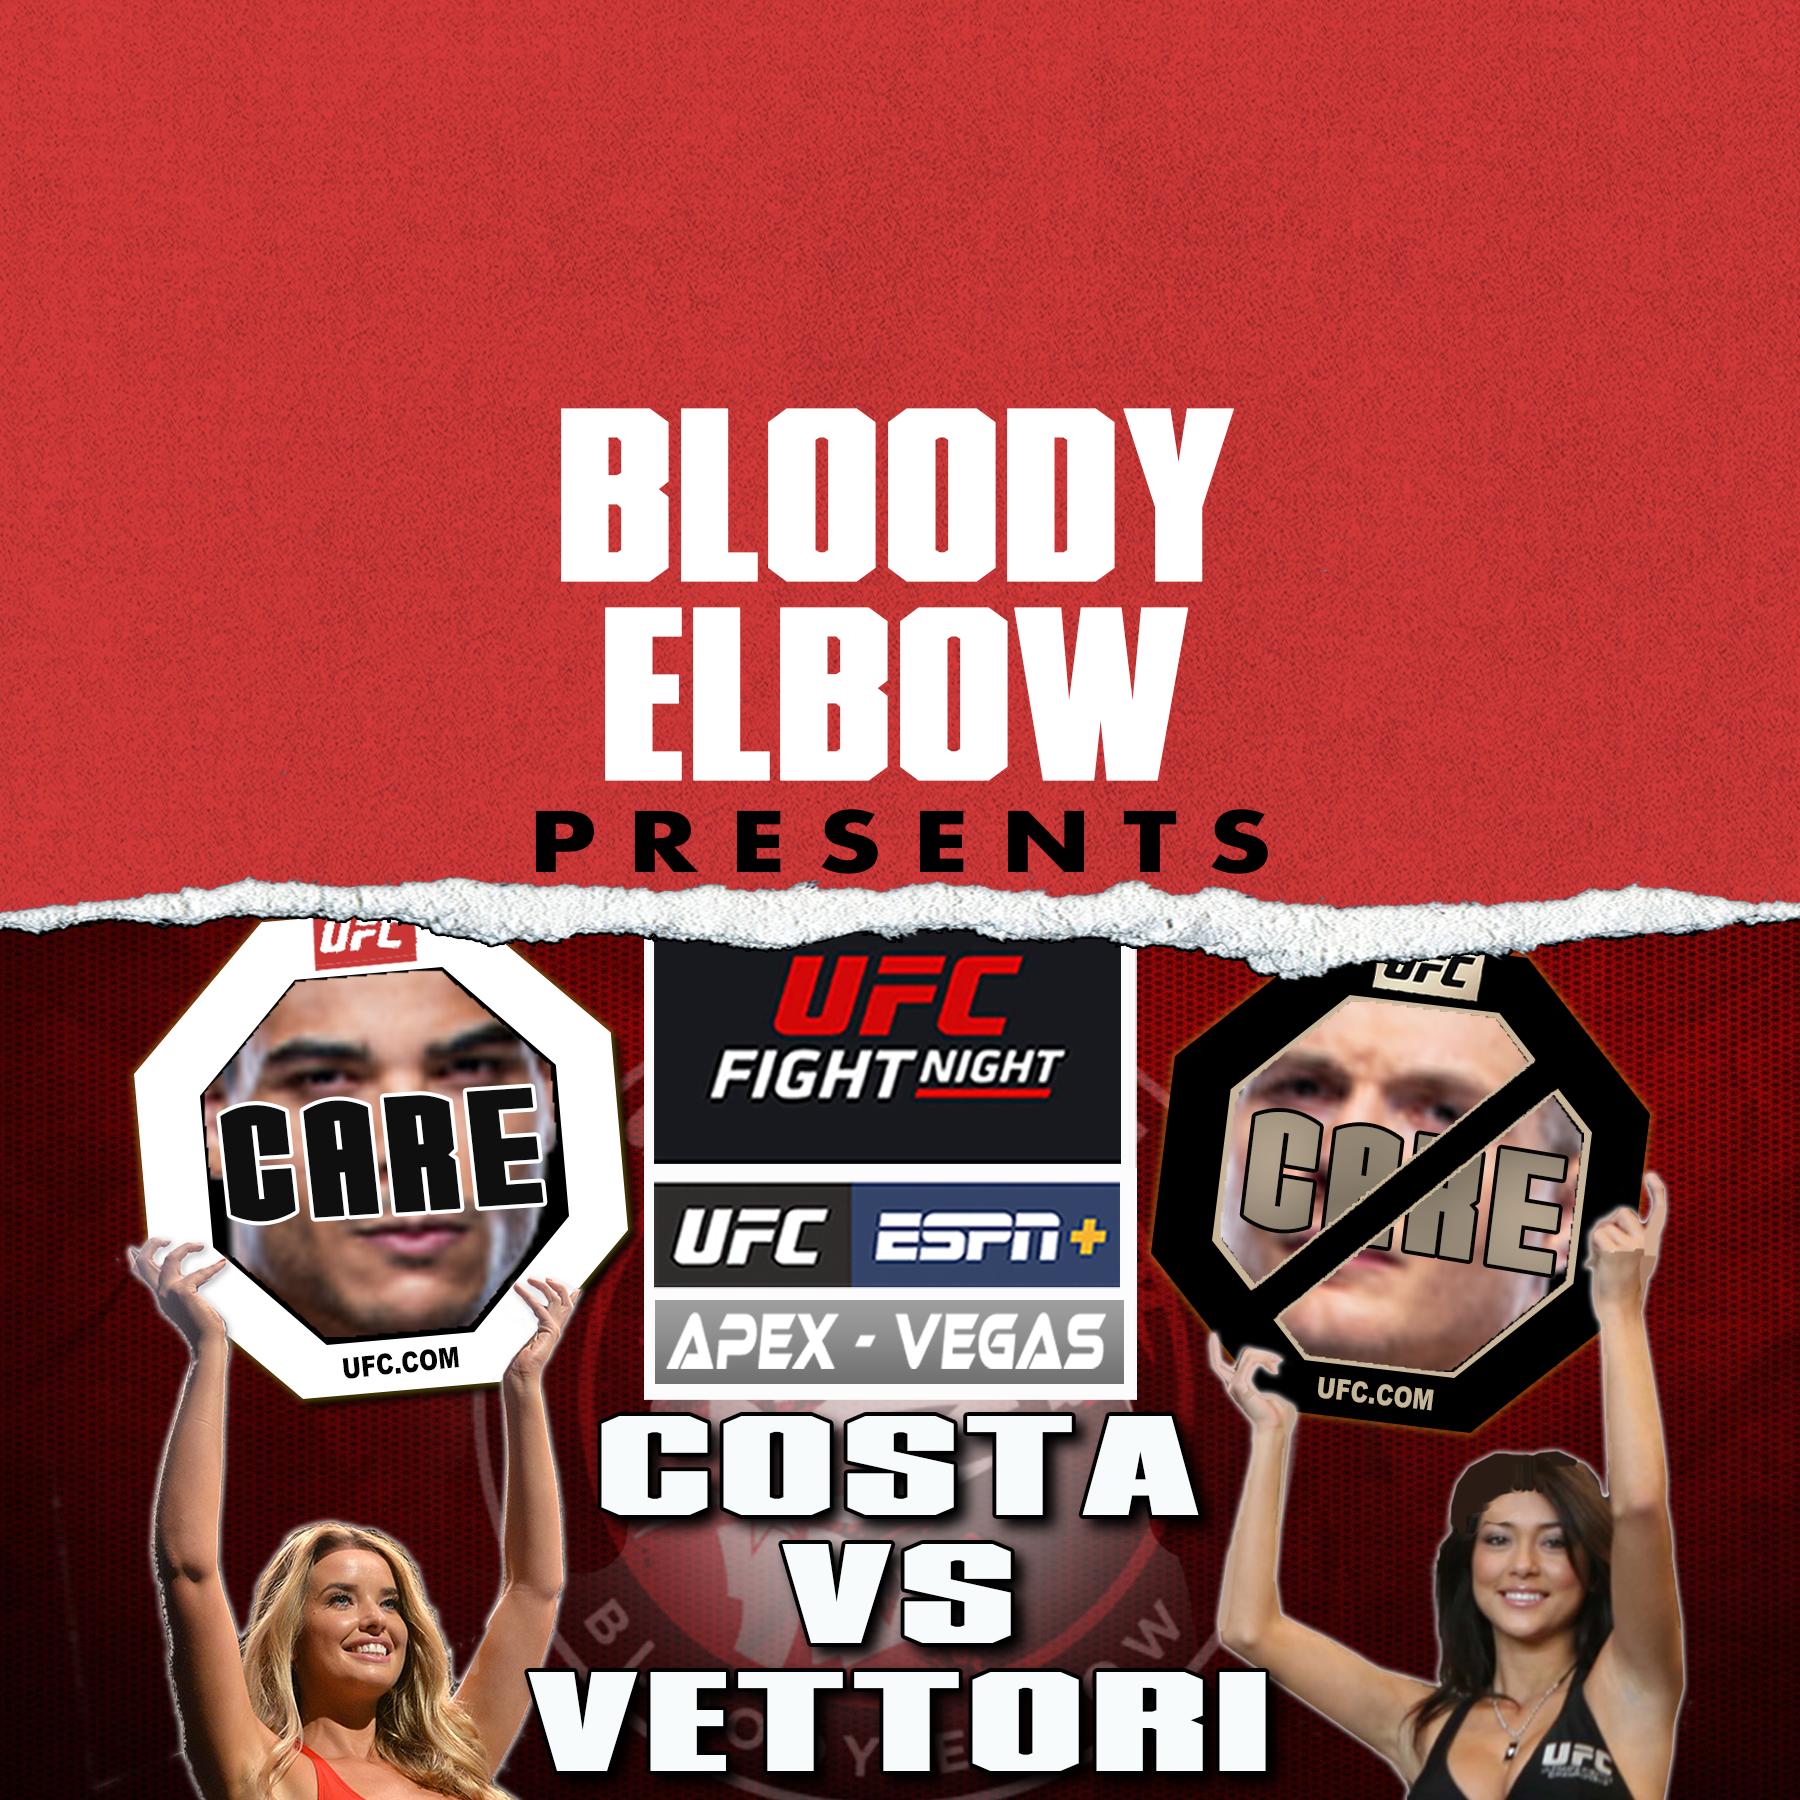 CDC, Care/Don't Care Podcast, UFC Vegas 40, UFC Vegas 41, UFC Podcast, Ladd vs Dumont, Costa vs Vettori, UFC Reactions, UFC Picks,